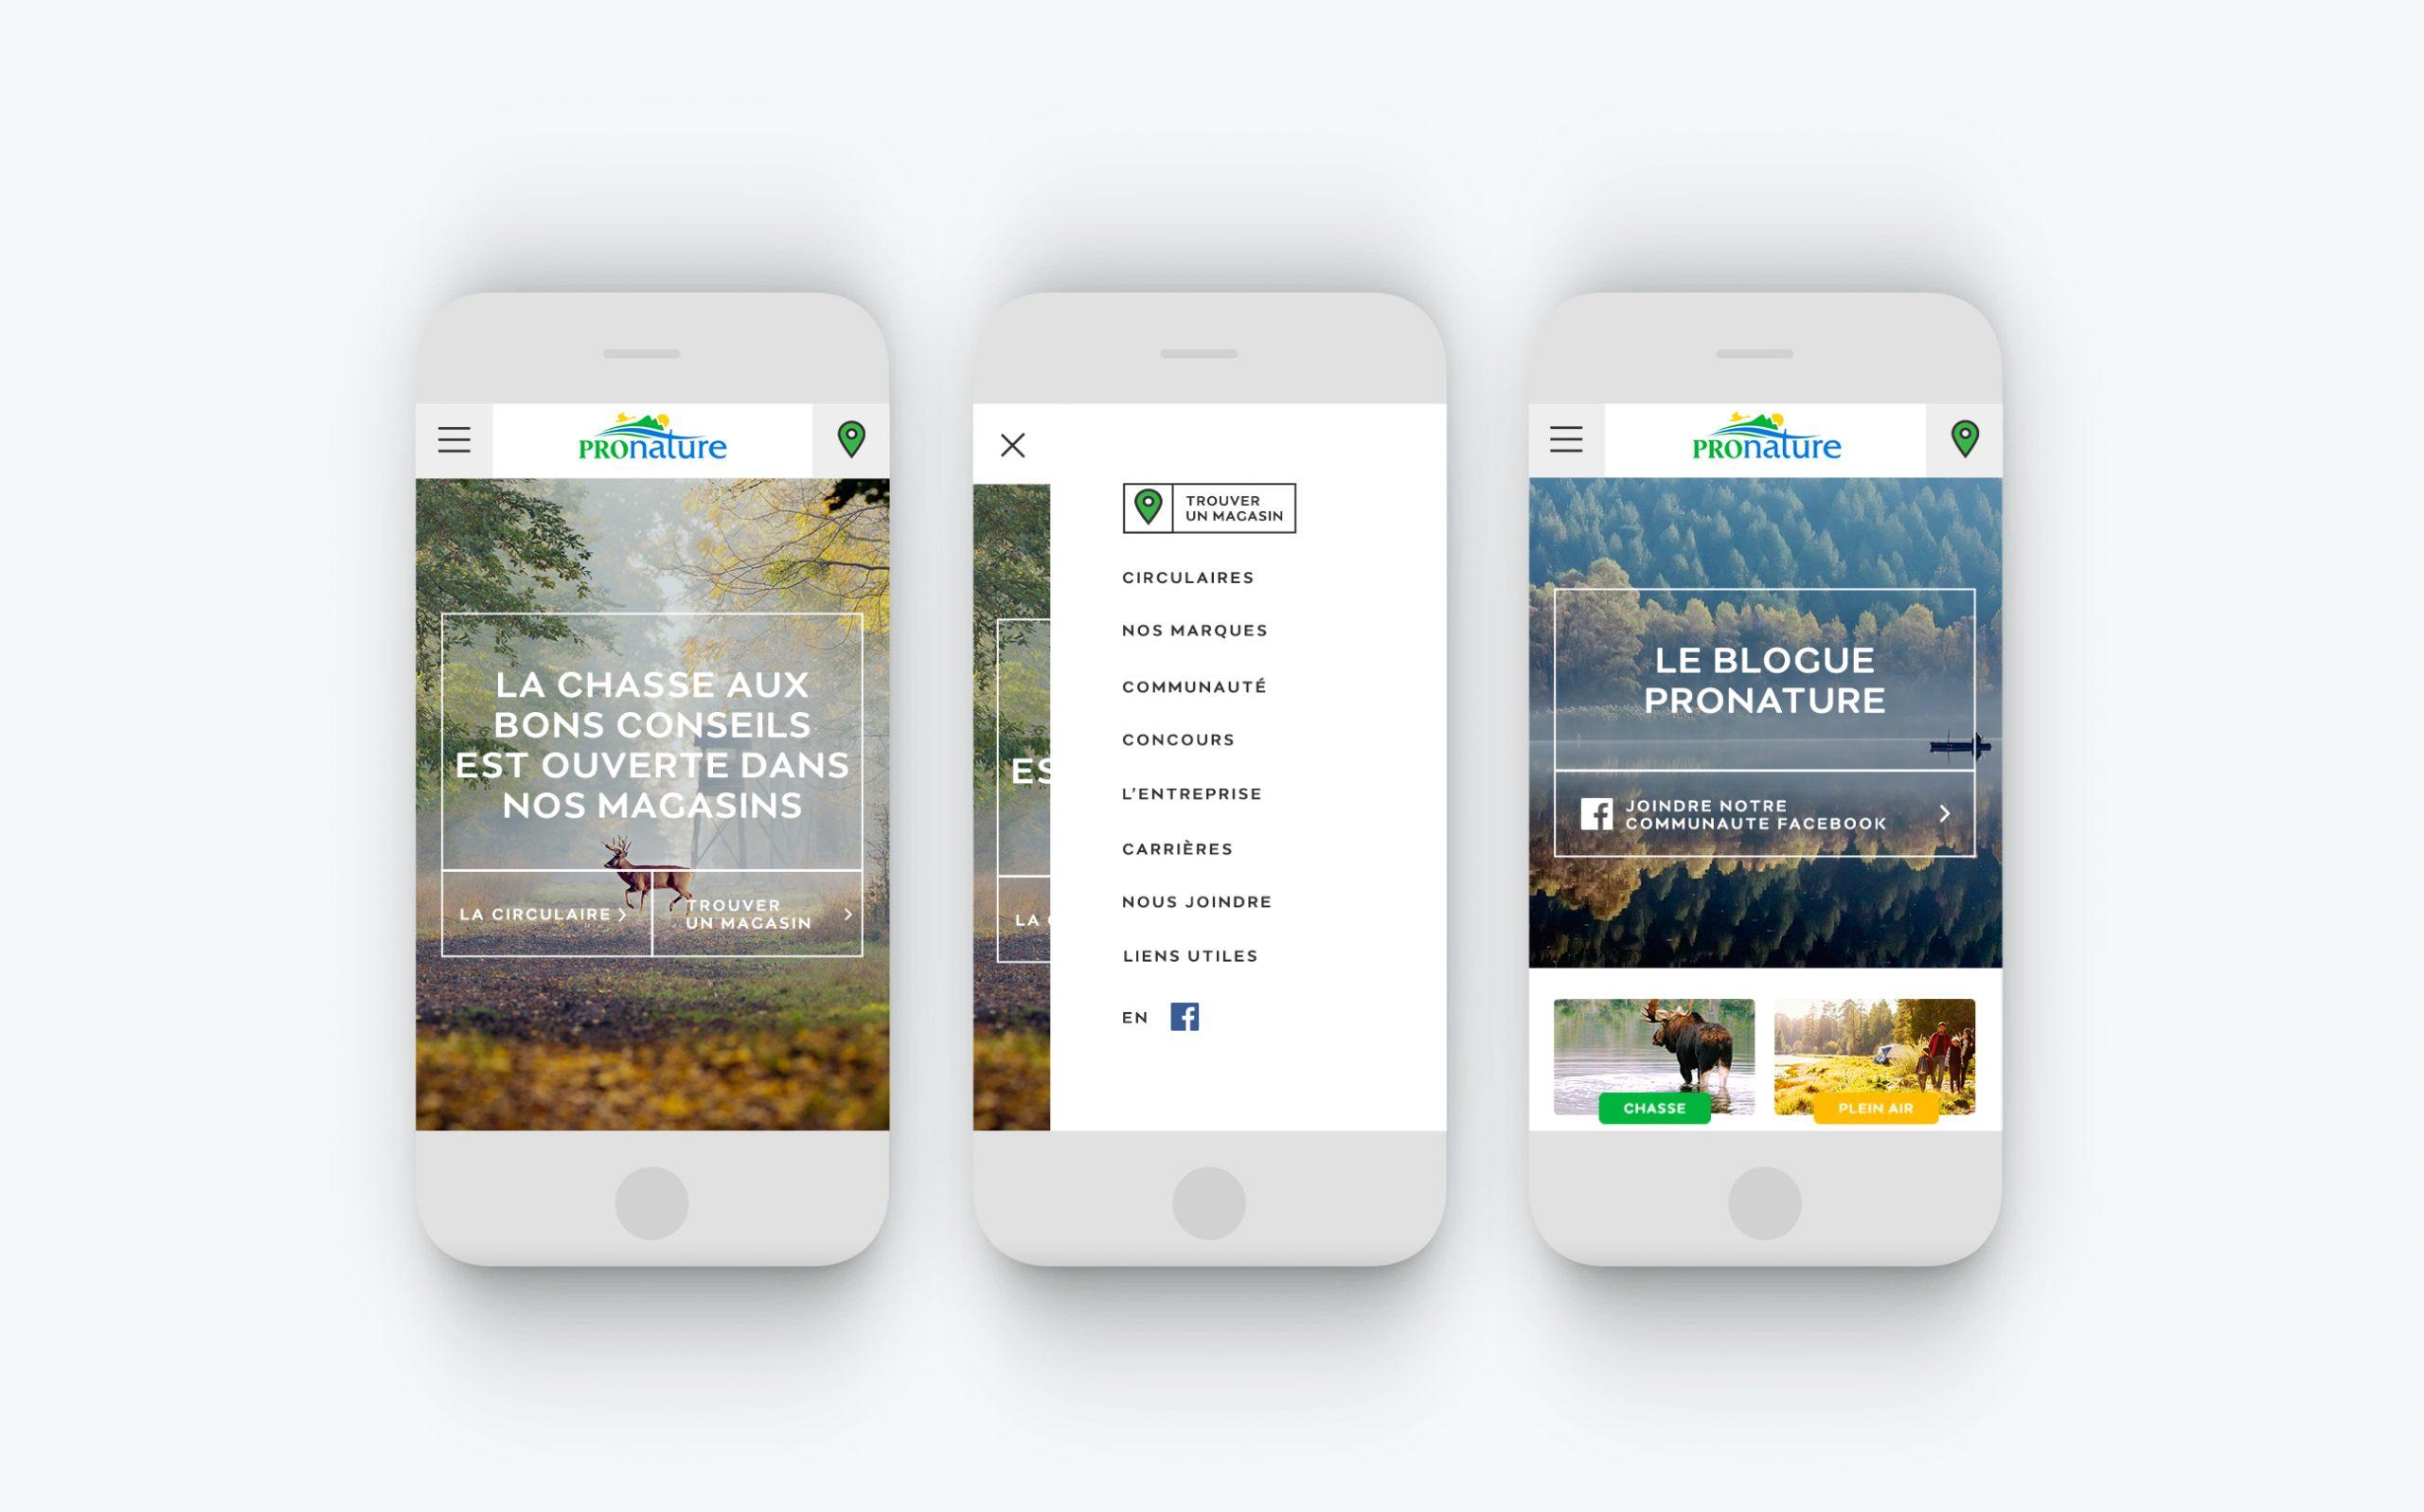 Turbulences-projet-pronature-site-web-mobile-blogue